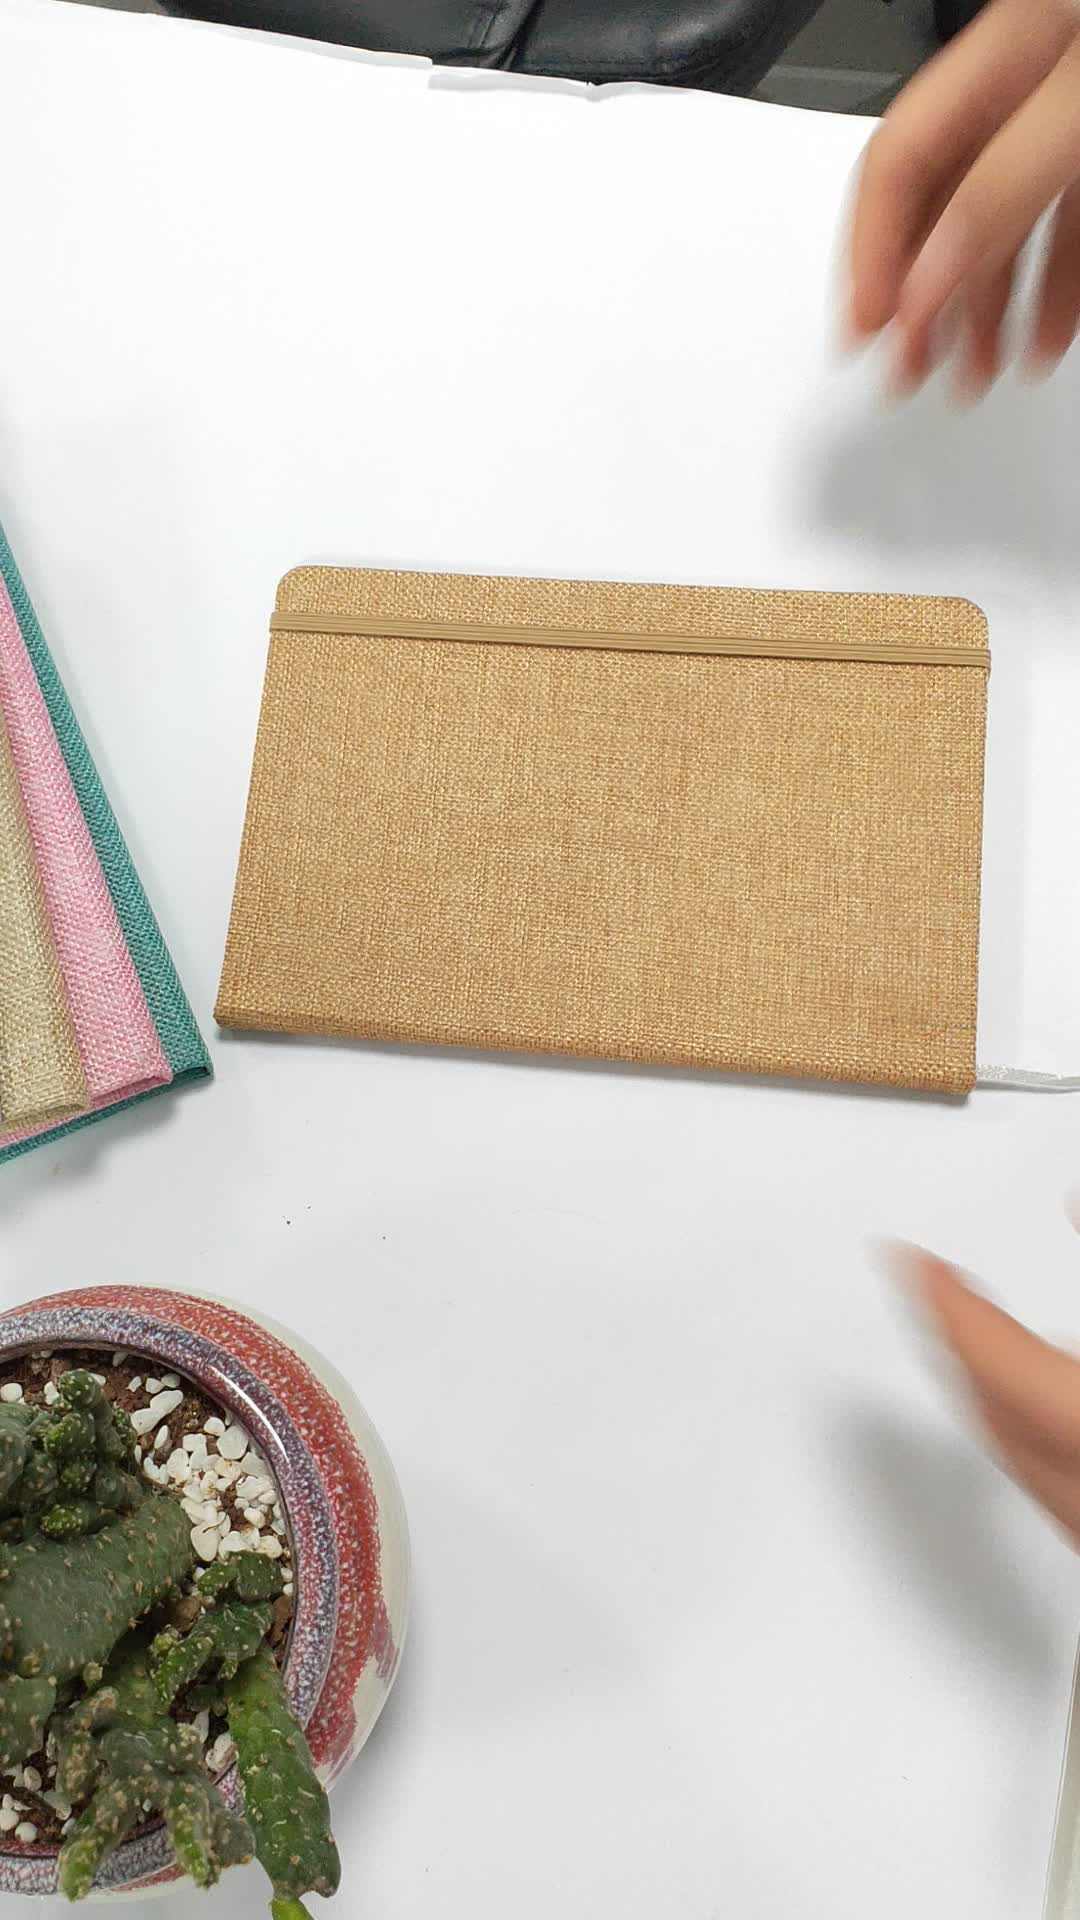 Grosir Disesuaikan Ukuran Cetak Dijahit Kerajinan Handmade Kain Penutup Linen Kertas Notebook